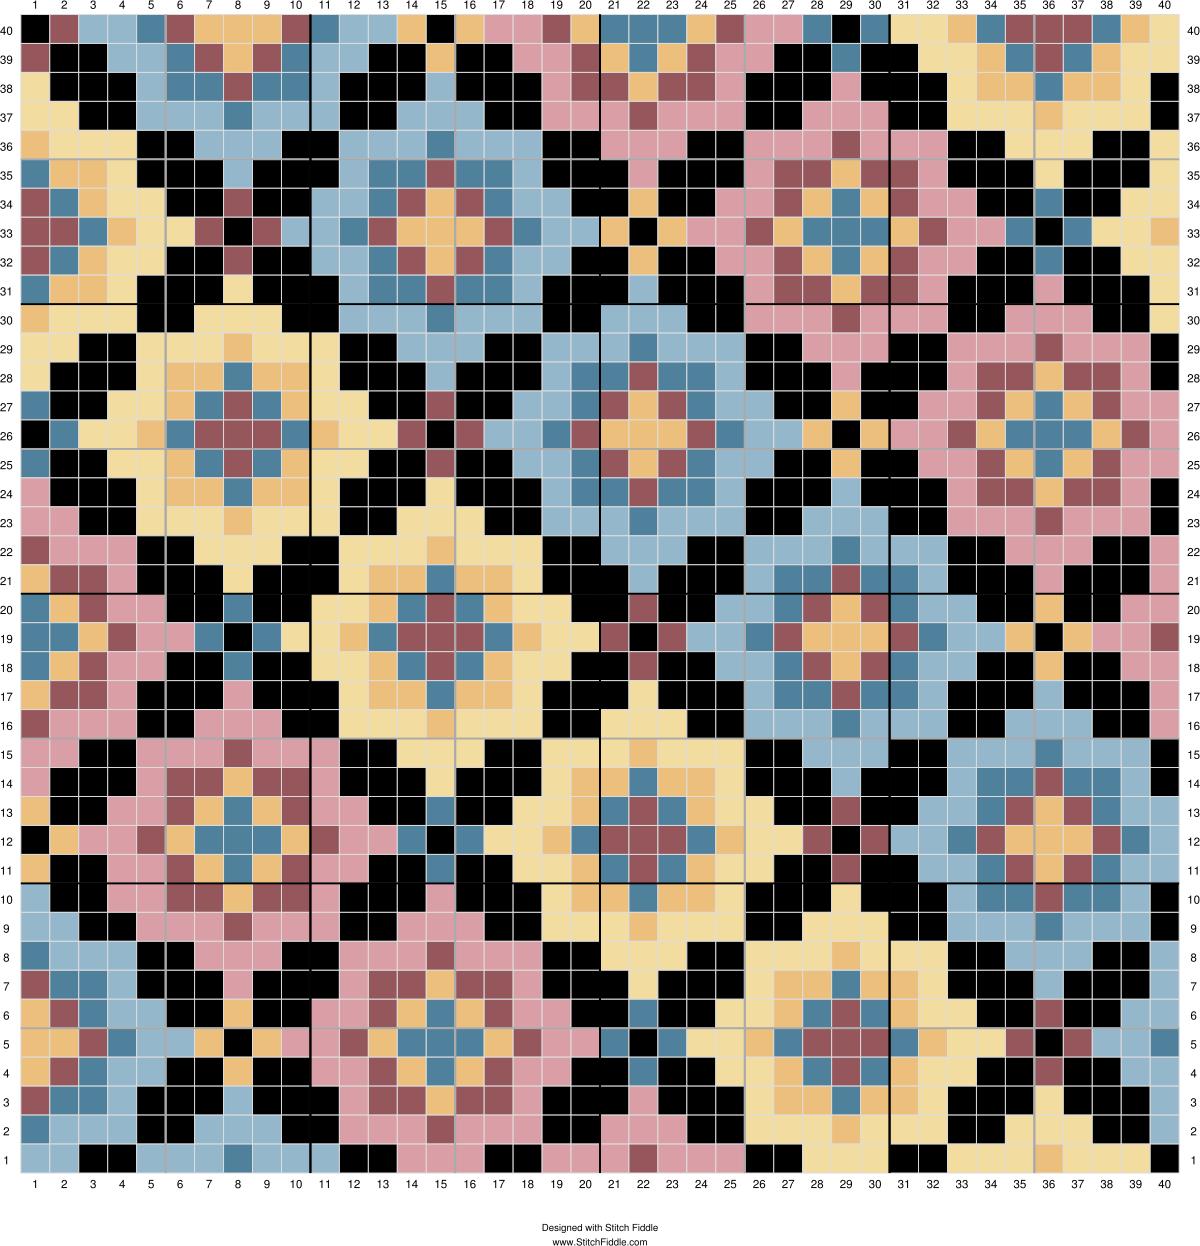 Pin de Betty Daza en betty wayuu | Pinterest | Mochilas y Patrones